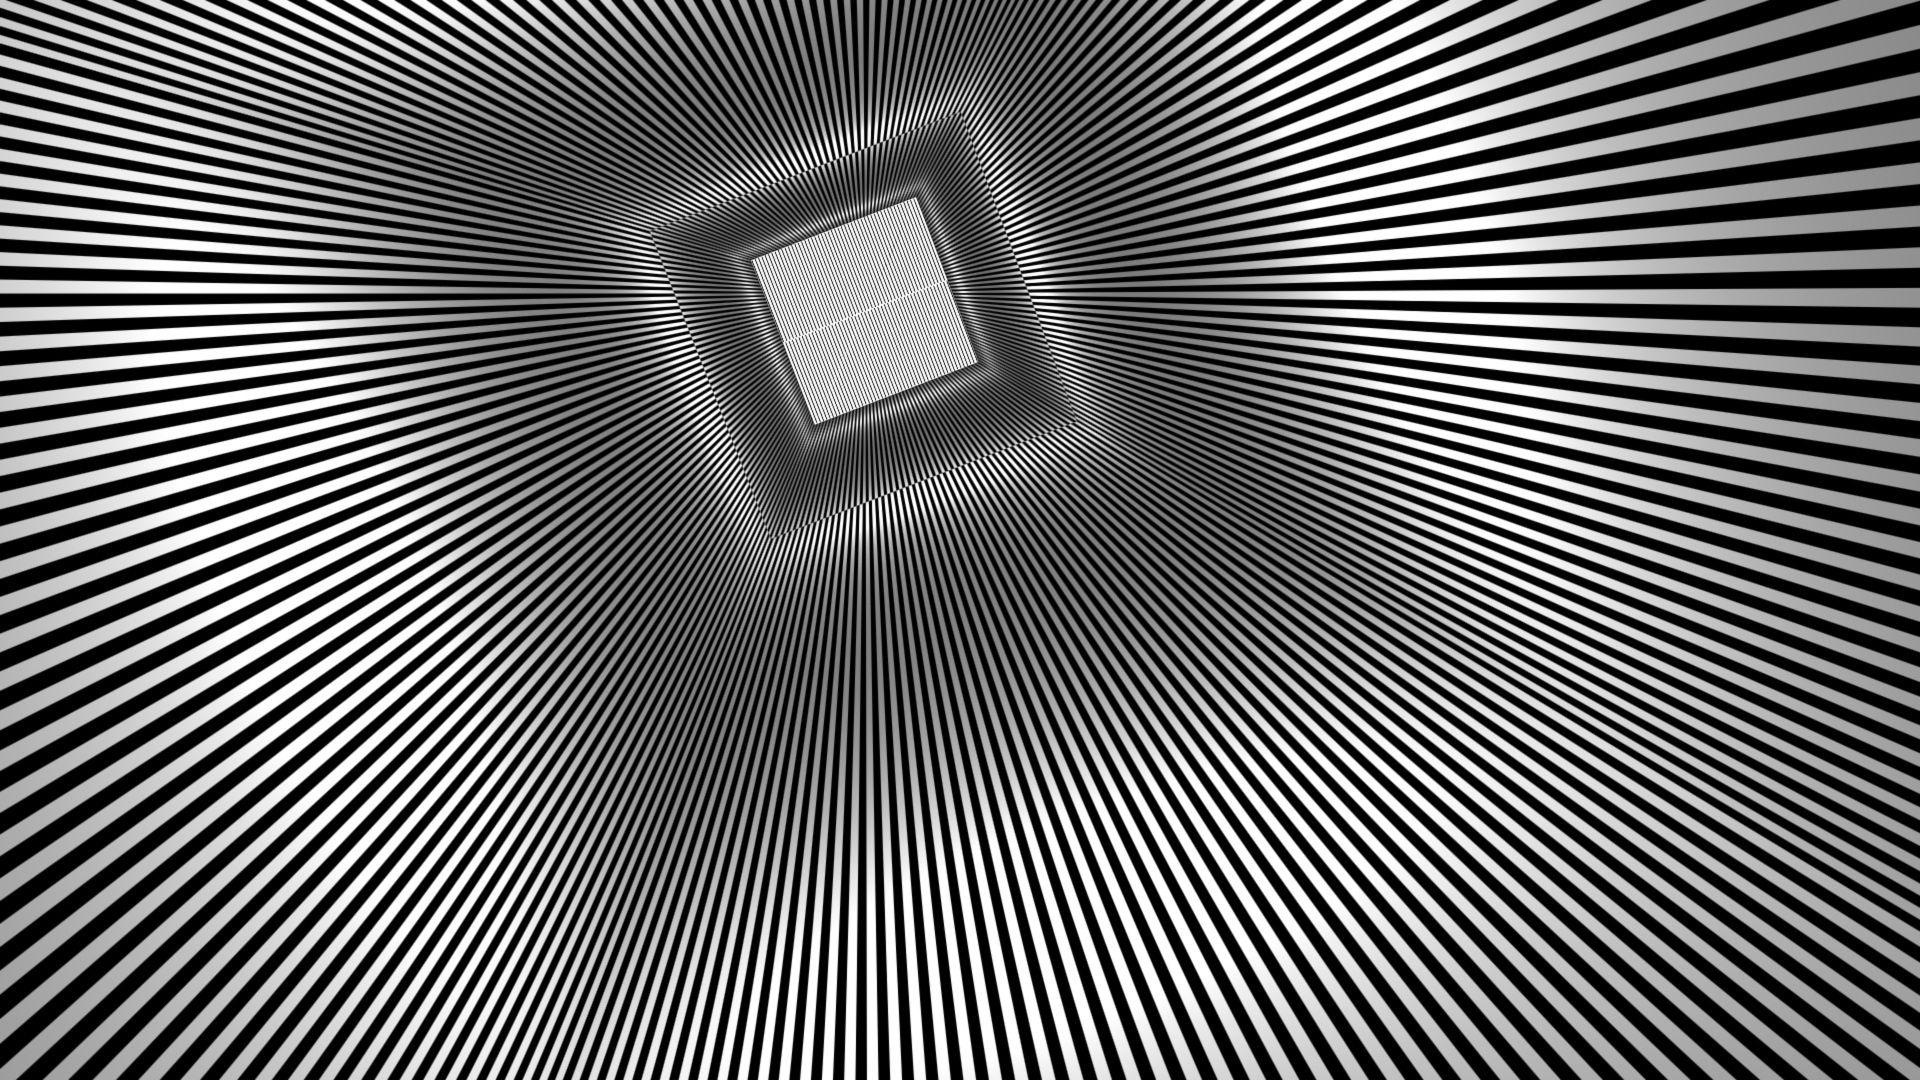 High Resolution 3d Illusion Wallpaper